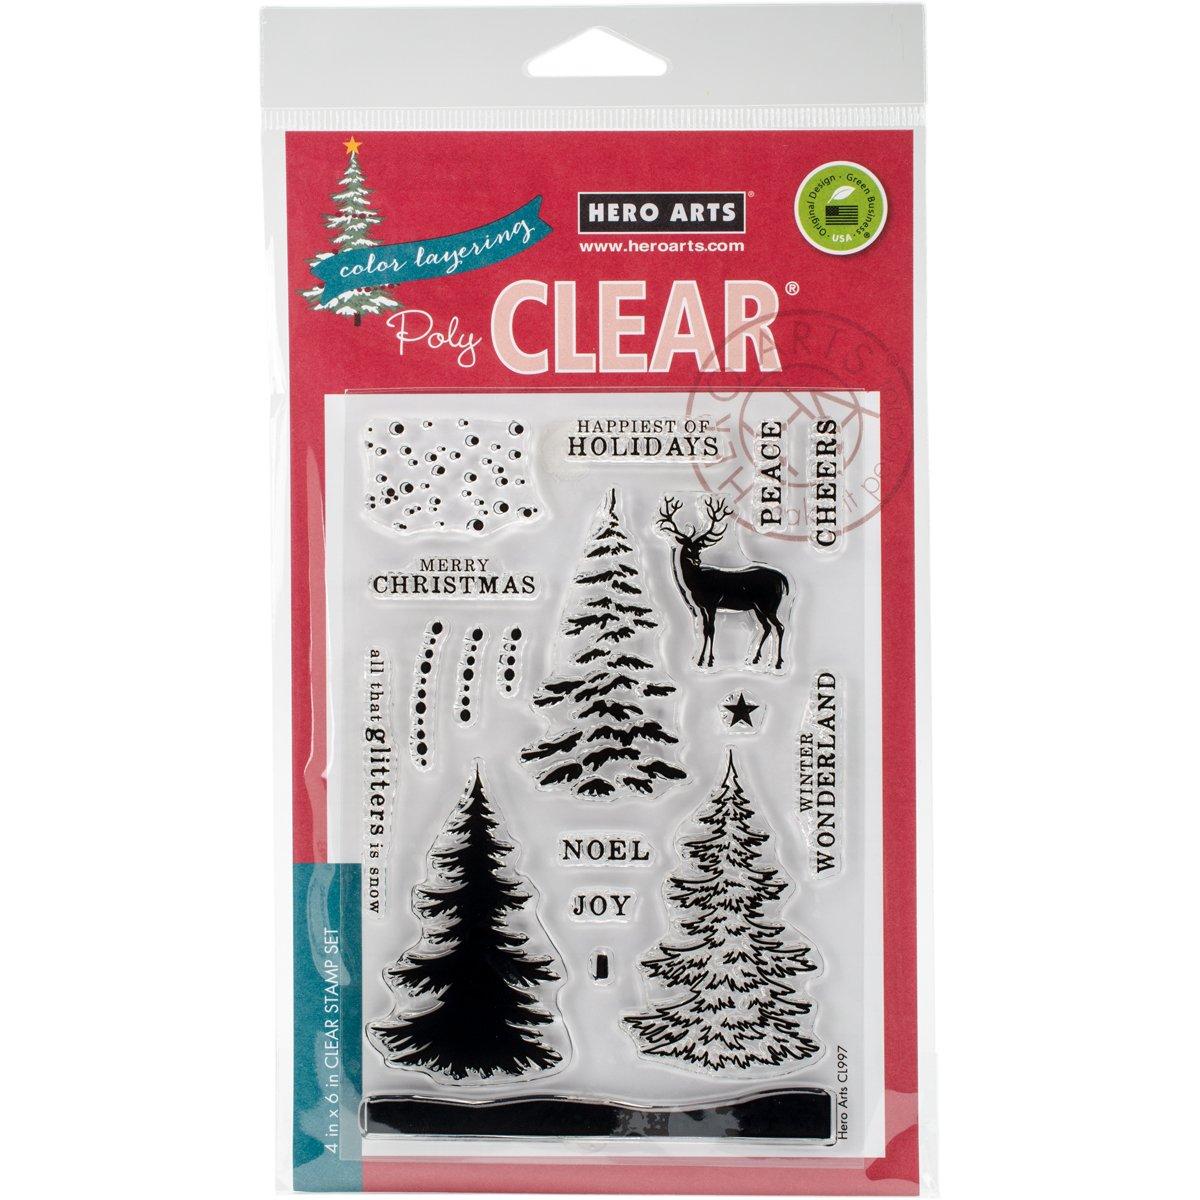 Hero Arts CL997 Color Layering Snowy Tree Card Making Kit